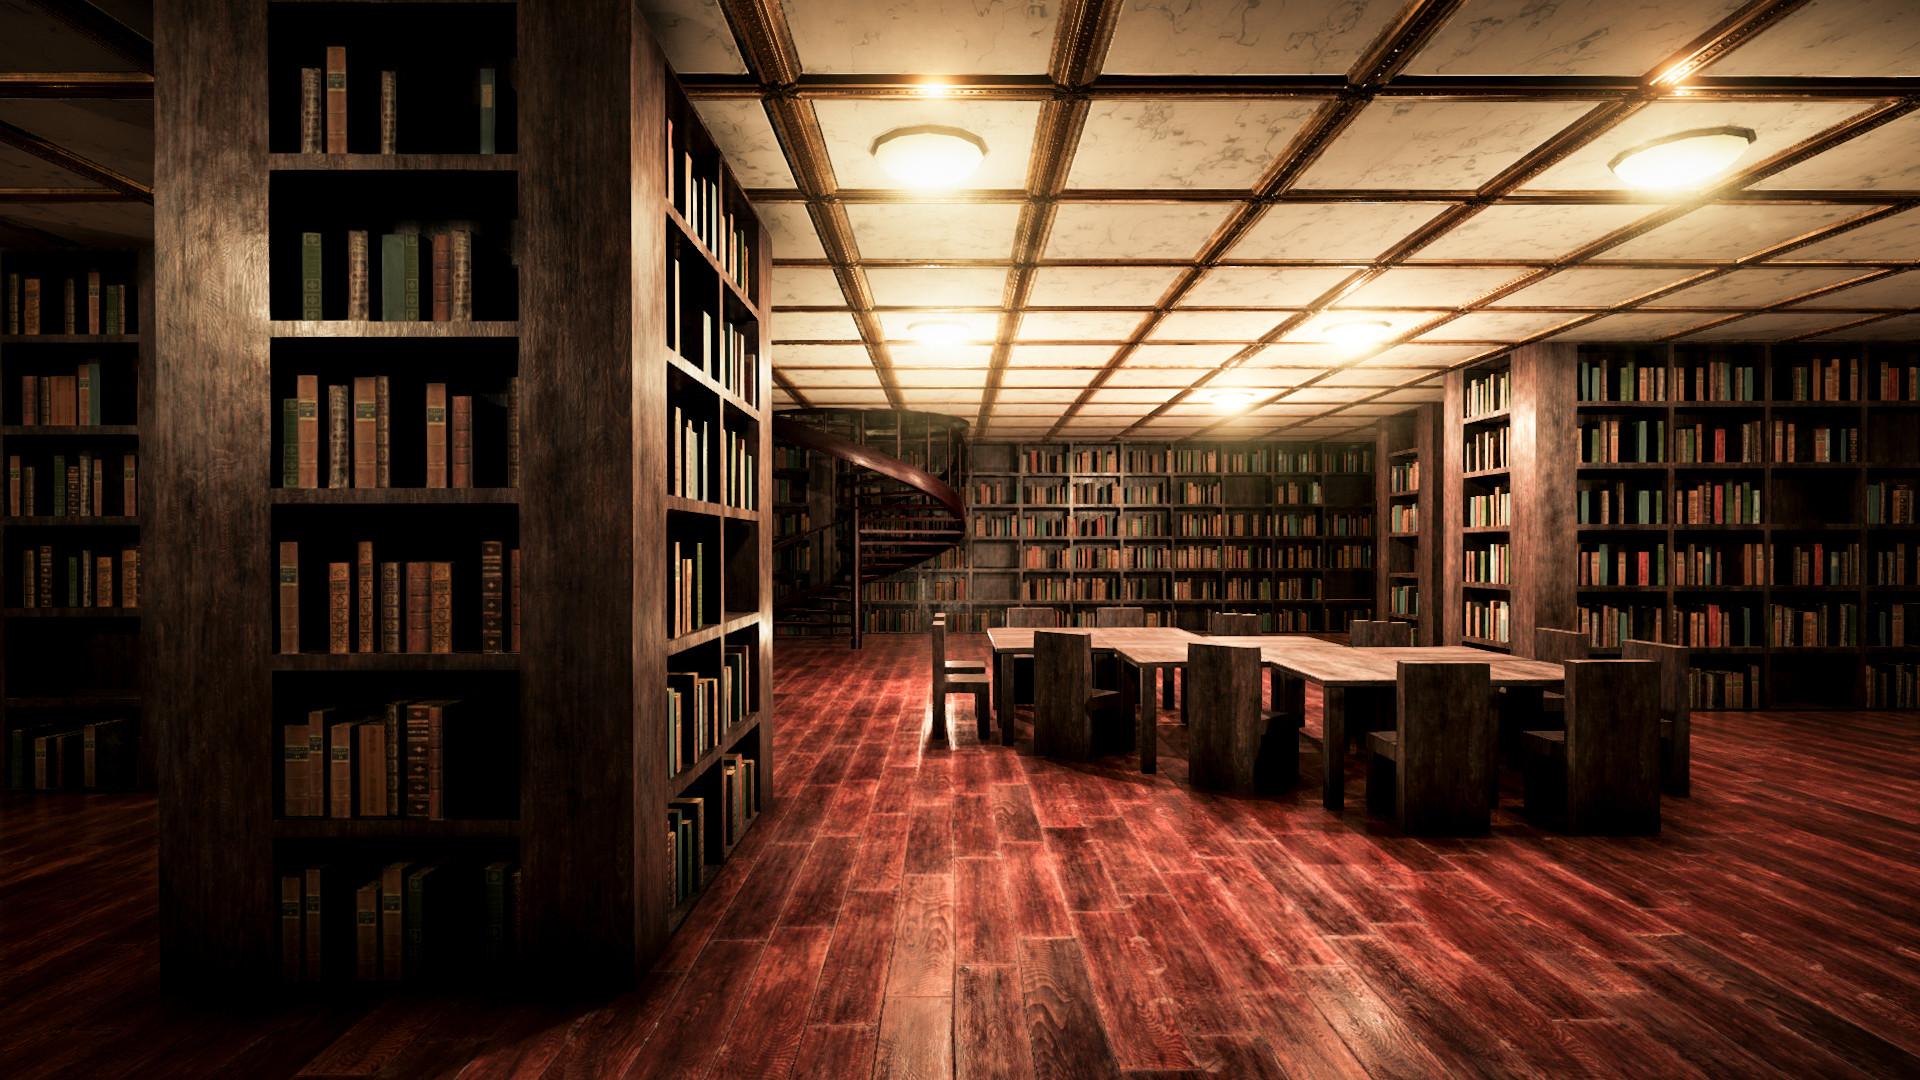 ArtStation - Procedural Library | Houdini Engine in Unity, Niklas Blume